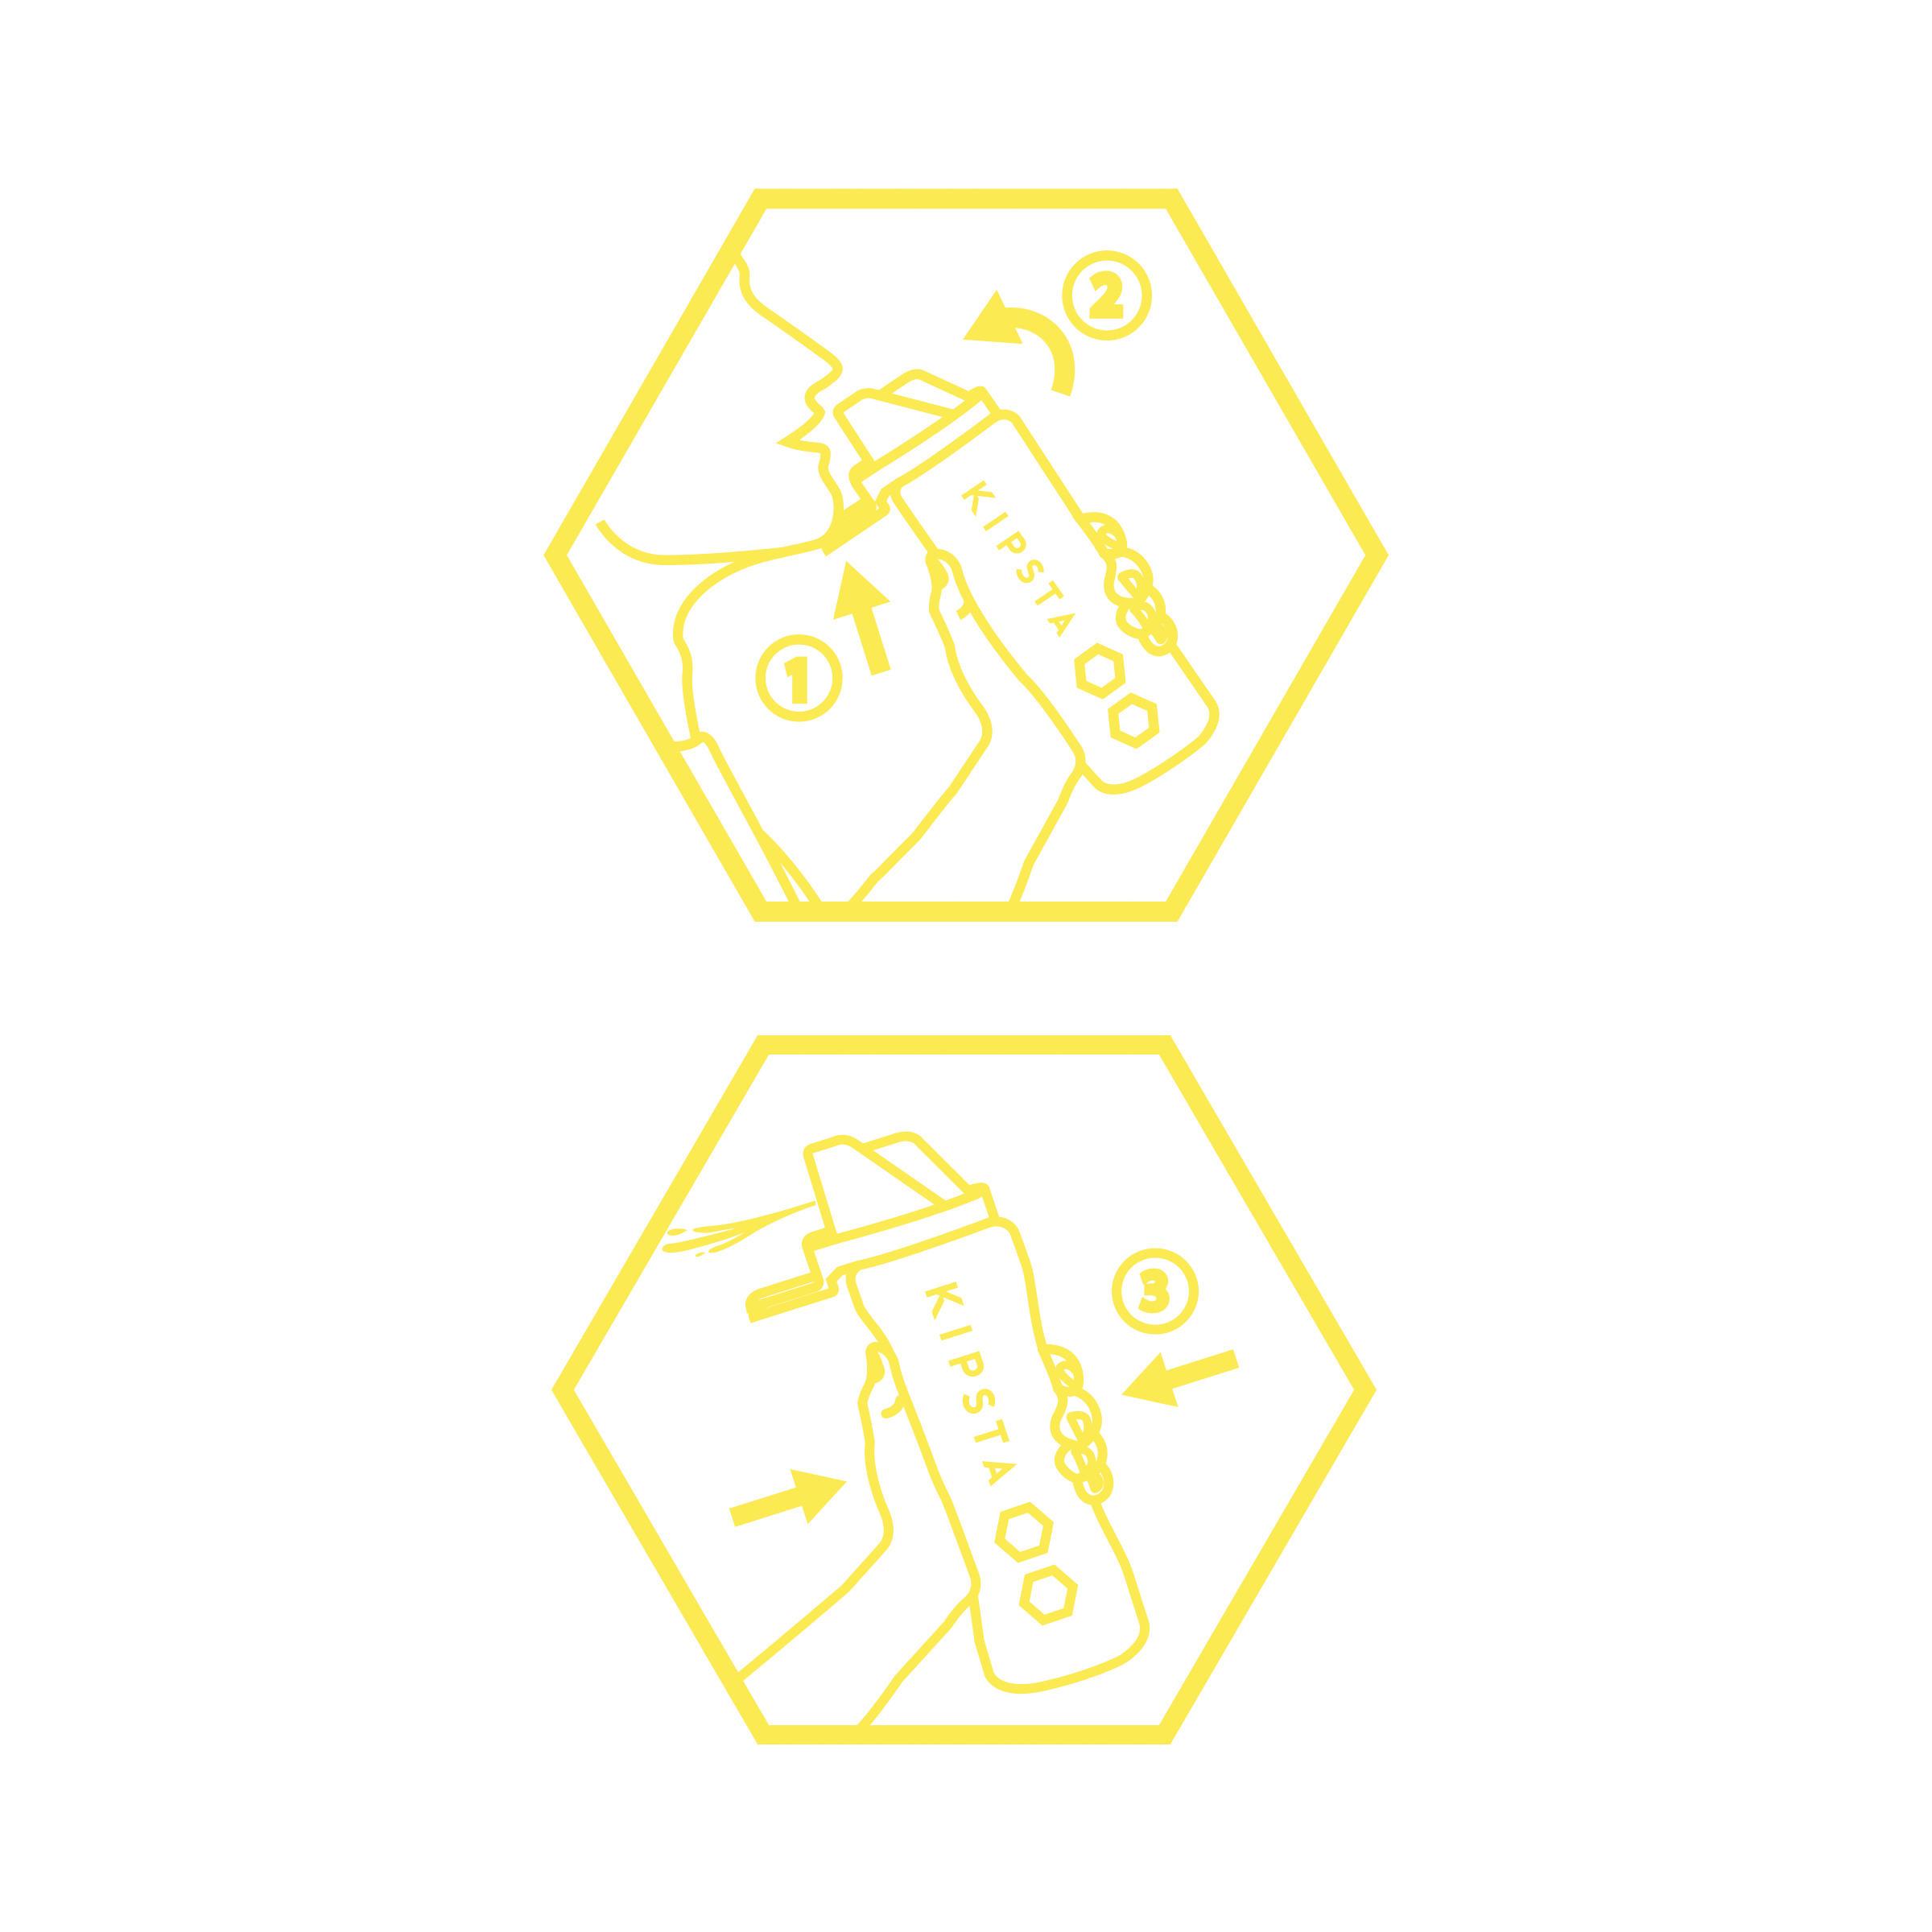 Hygienic 1 Litre Water Bottle - White/Yellow